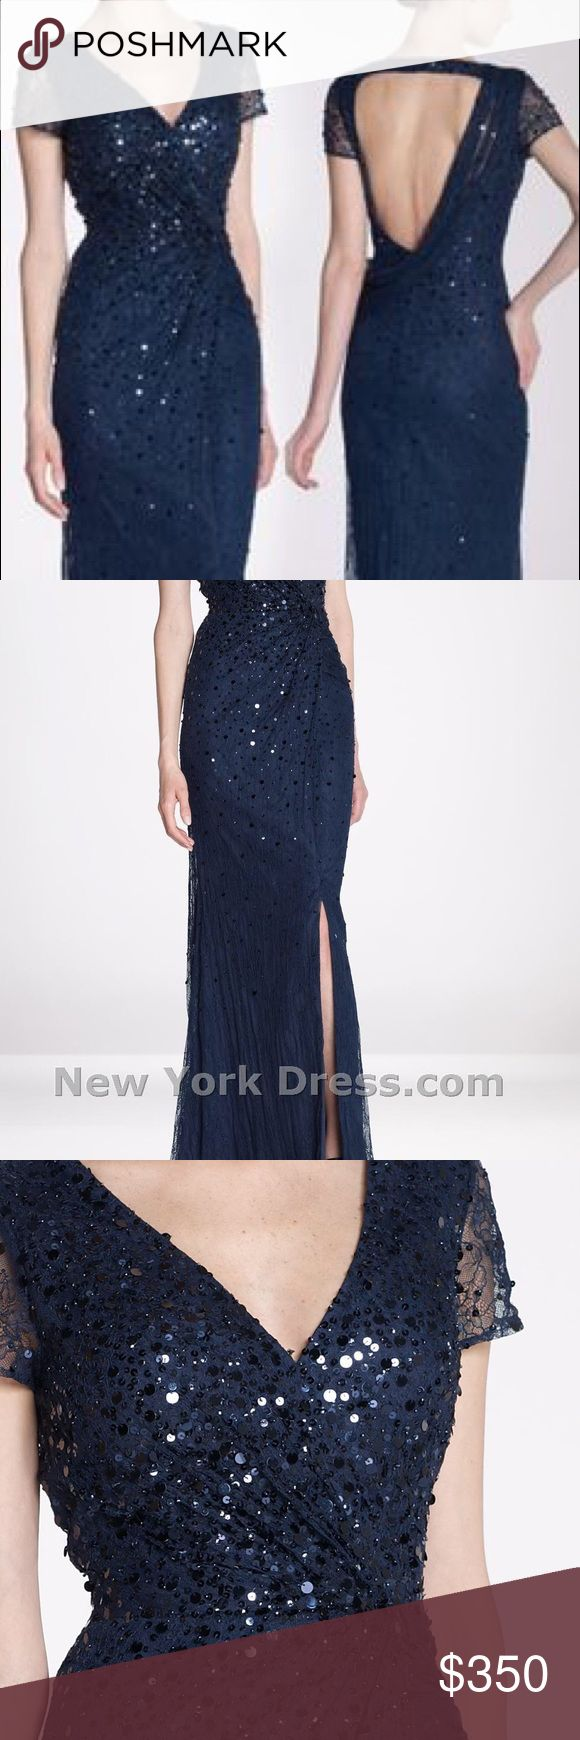 New Kathy Hilton Dress Blue long dress. New with tags Kathy Hilton Dresses